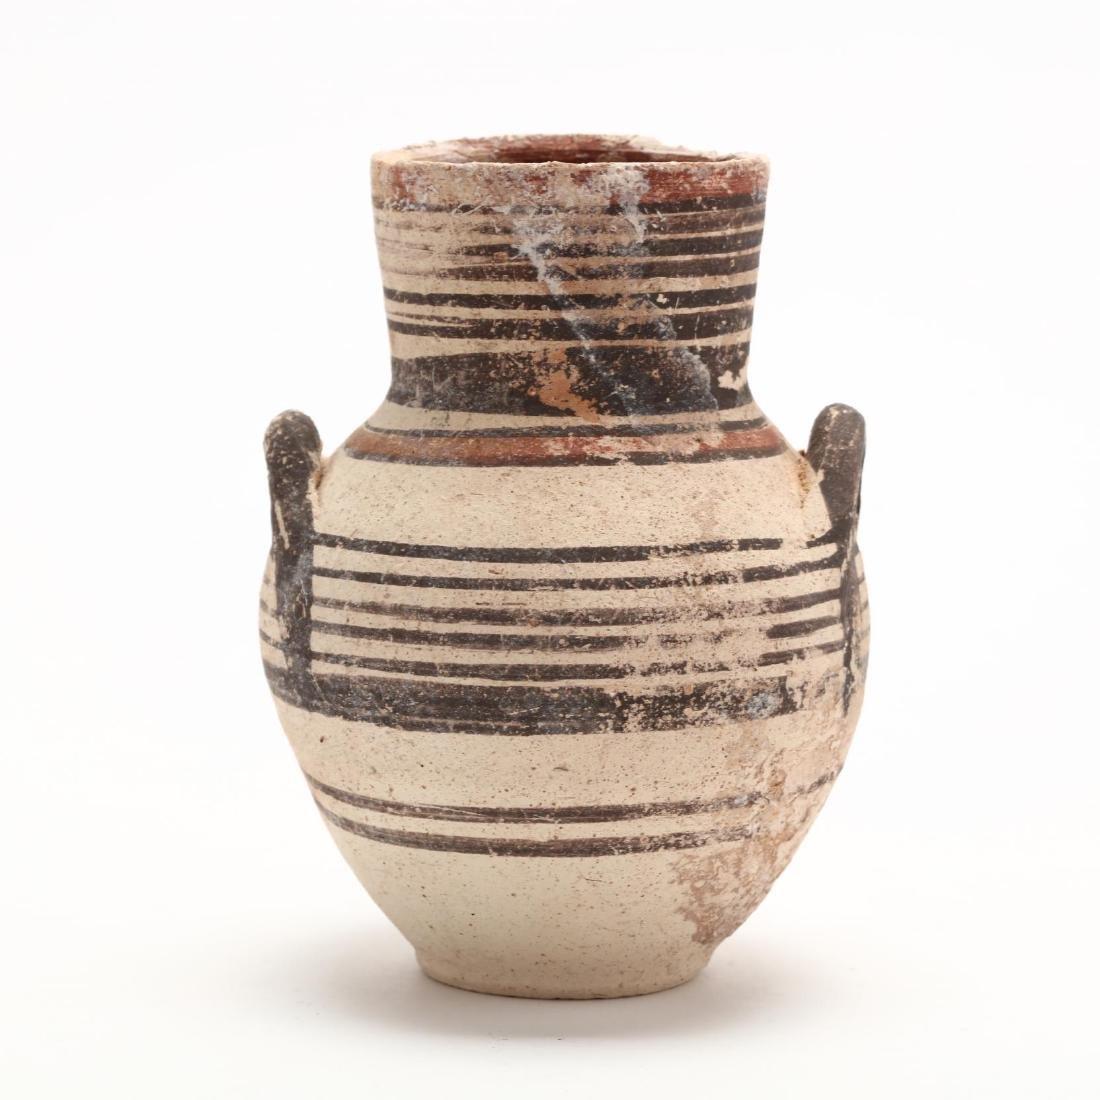 Cypro-Geometric Creme Ware Small Amphora, Ex. Haggard - 4